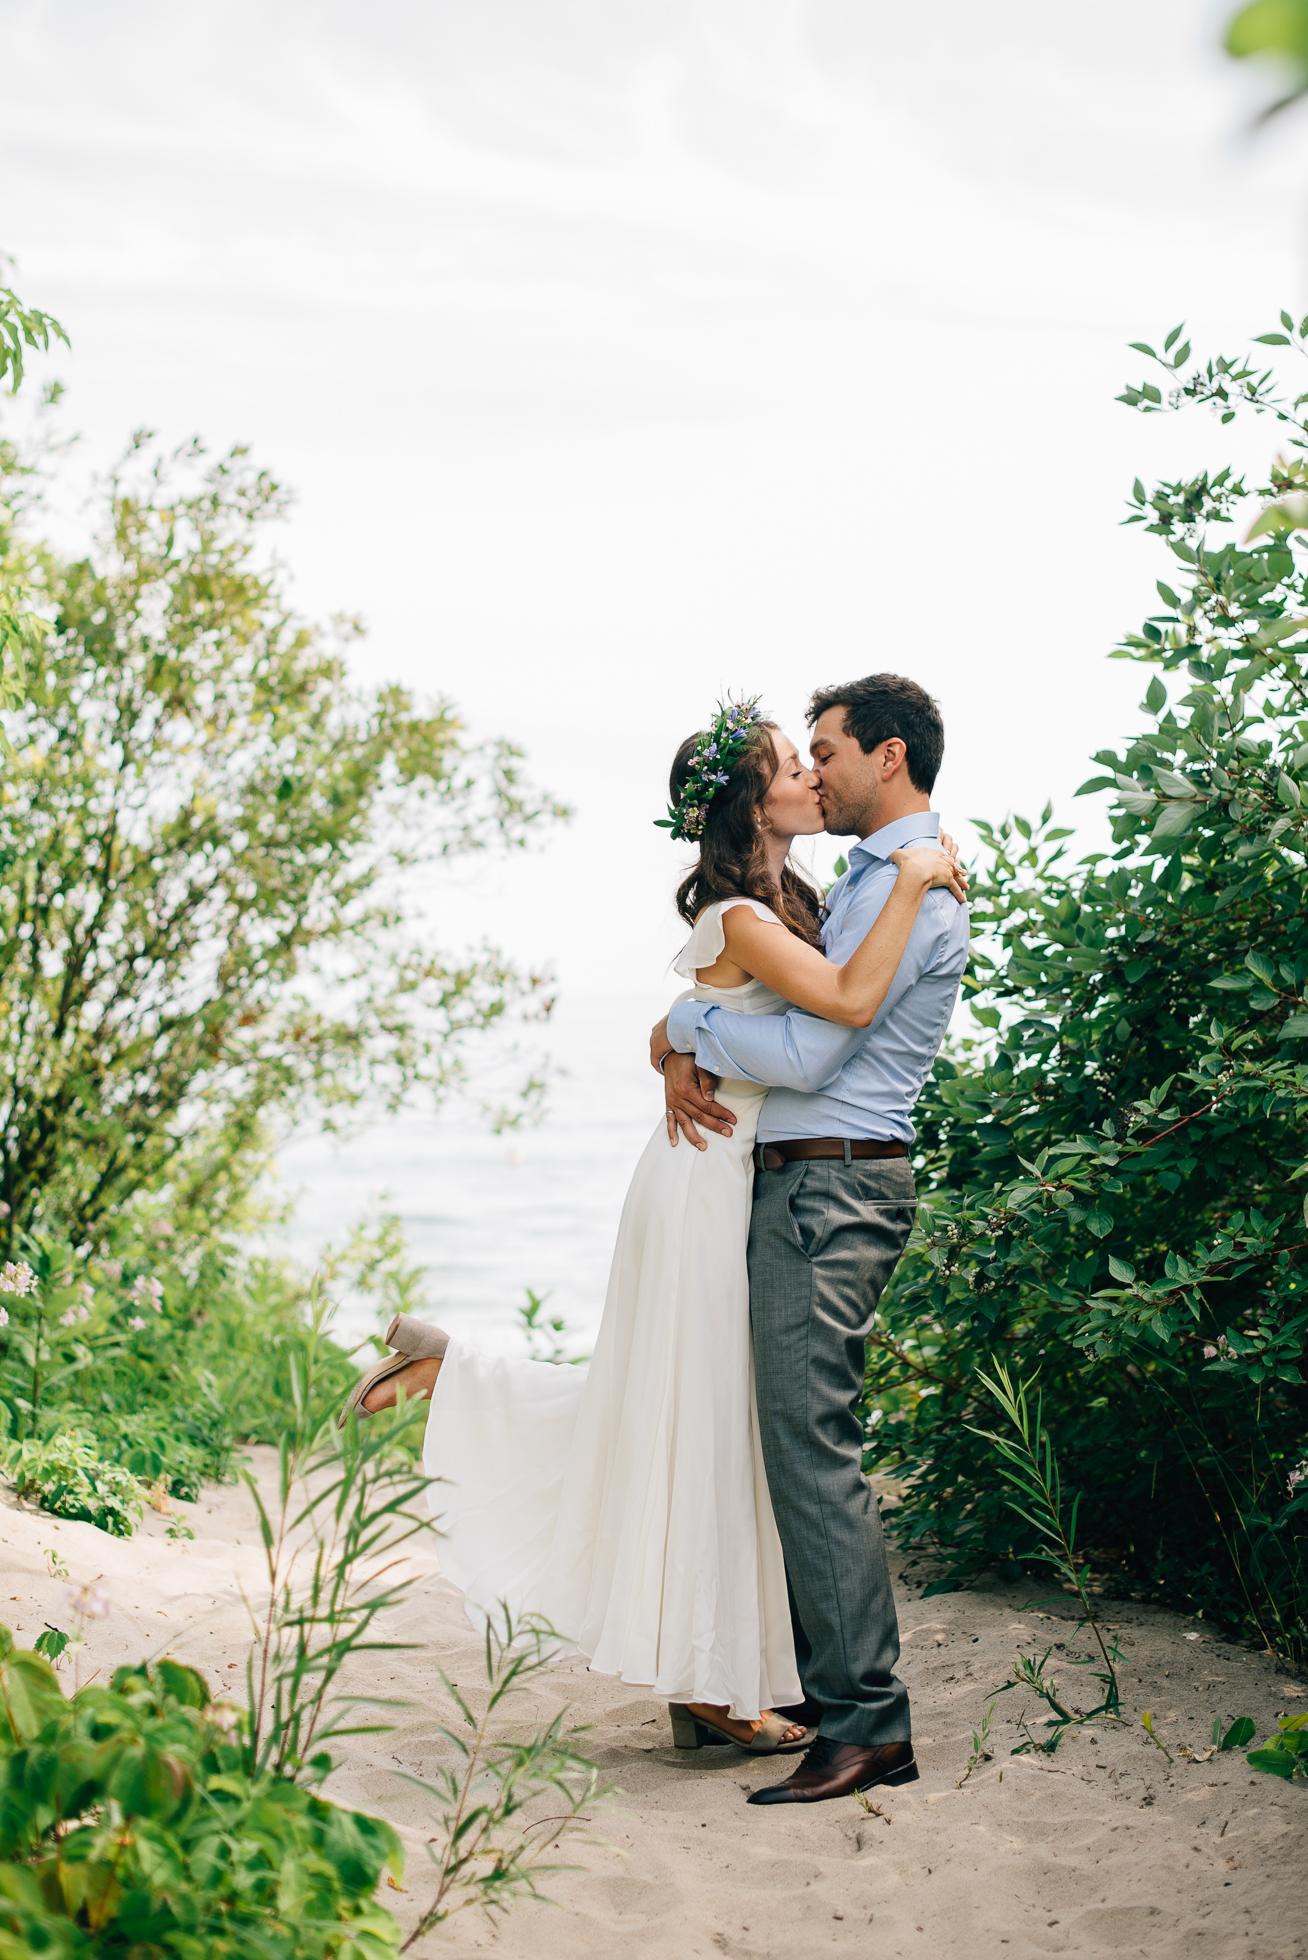 Artscape-Gibraltar-Point-Wedding-Photography026.jpg